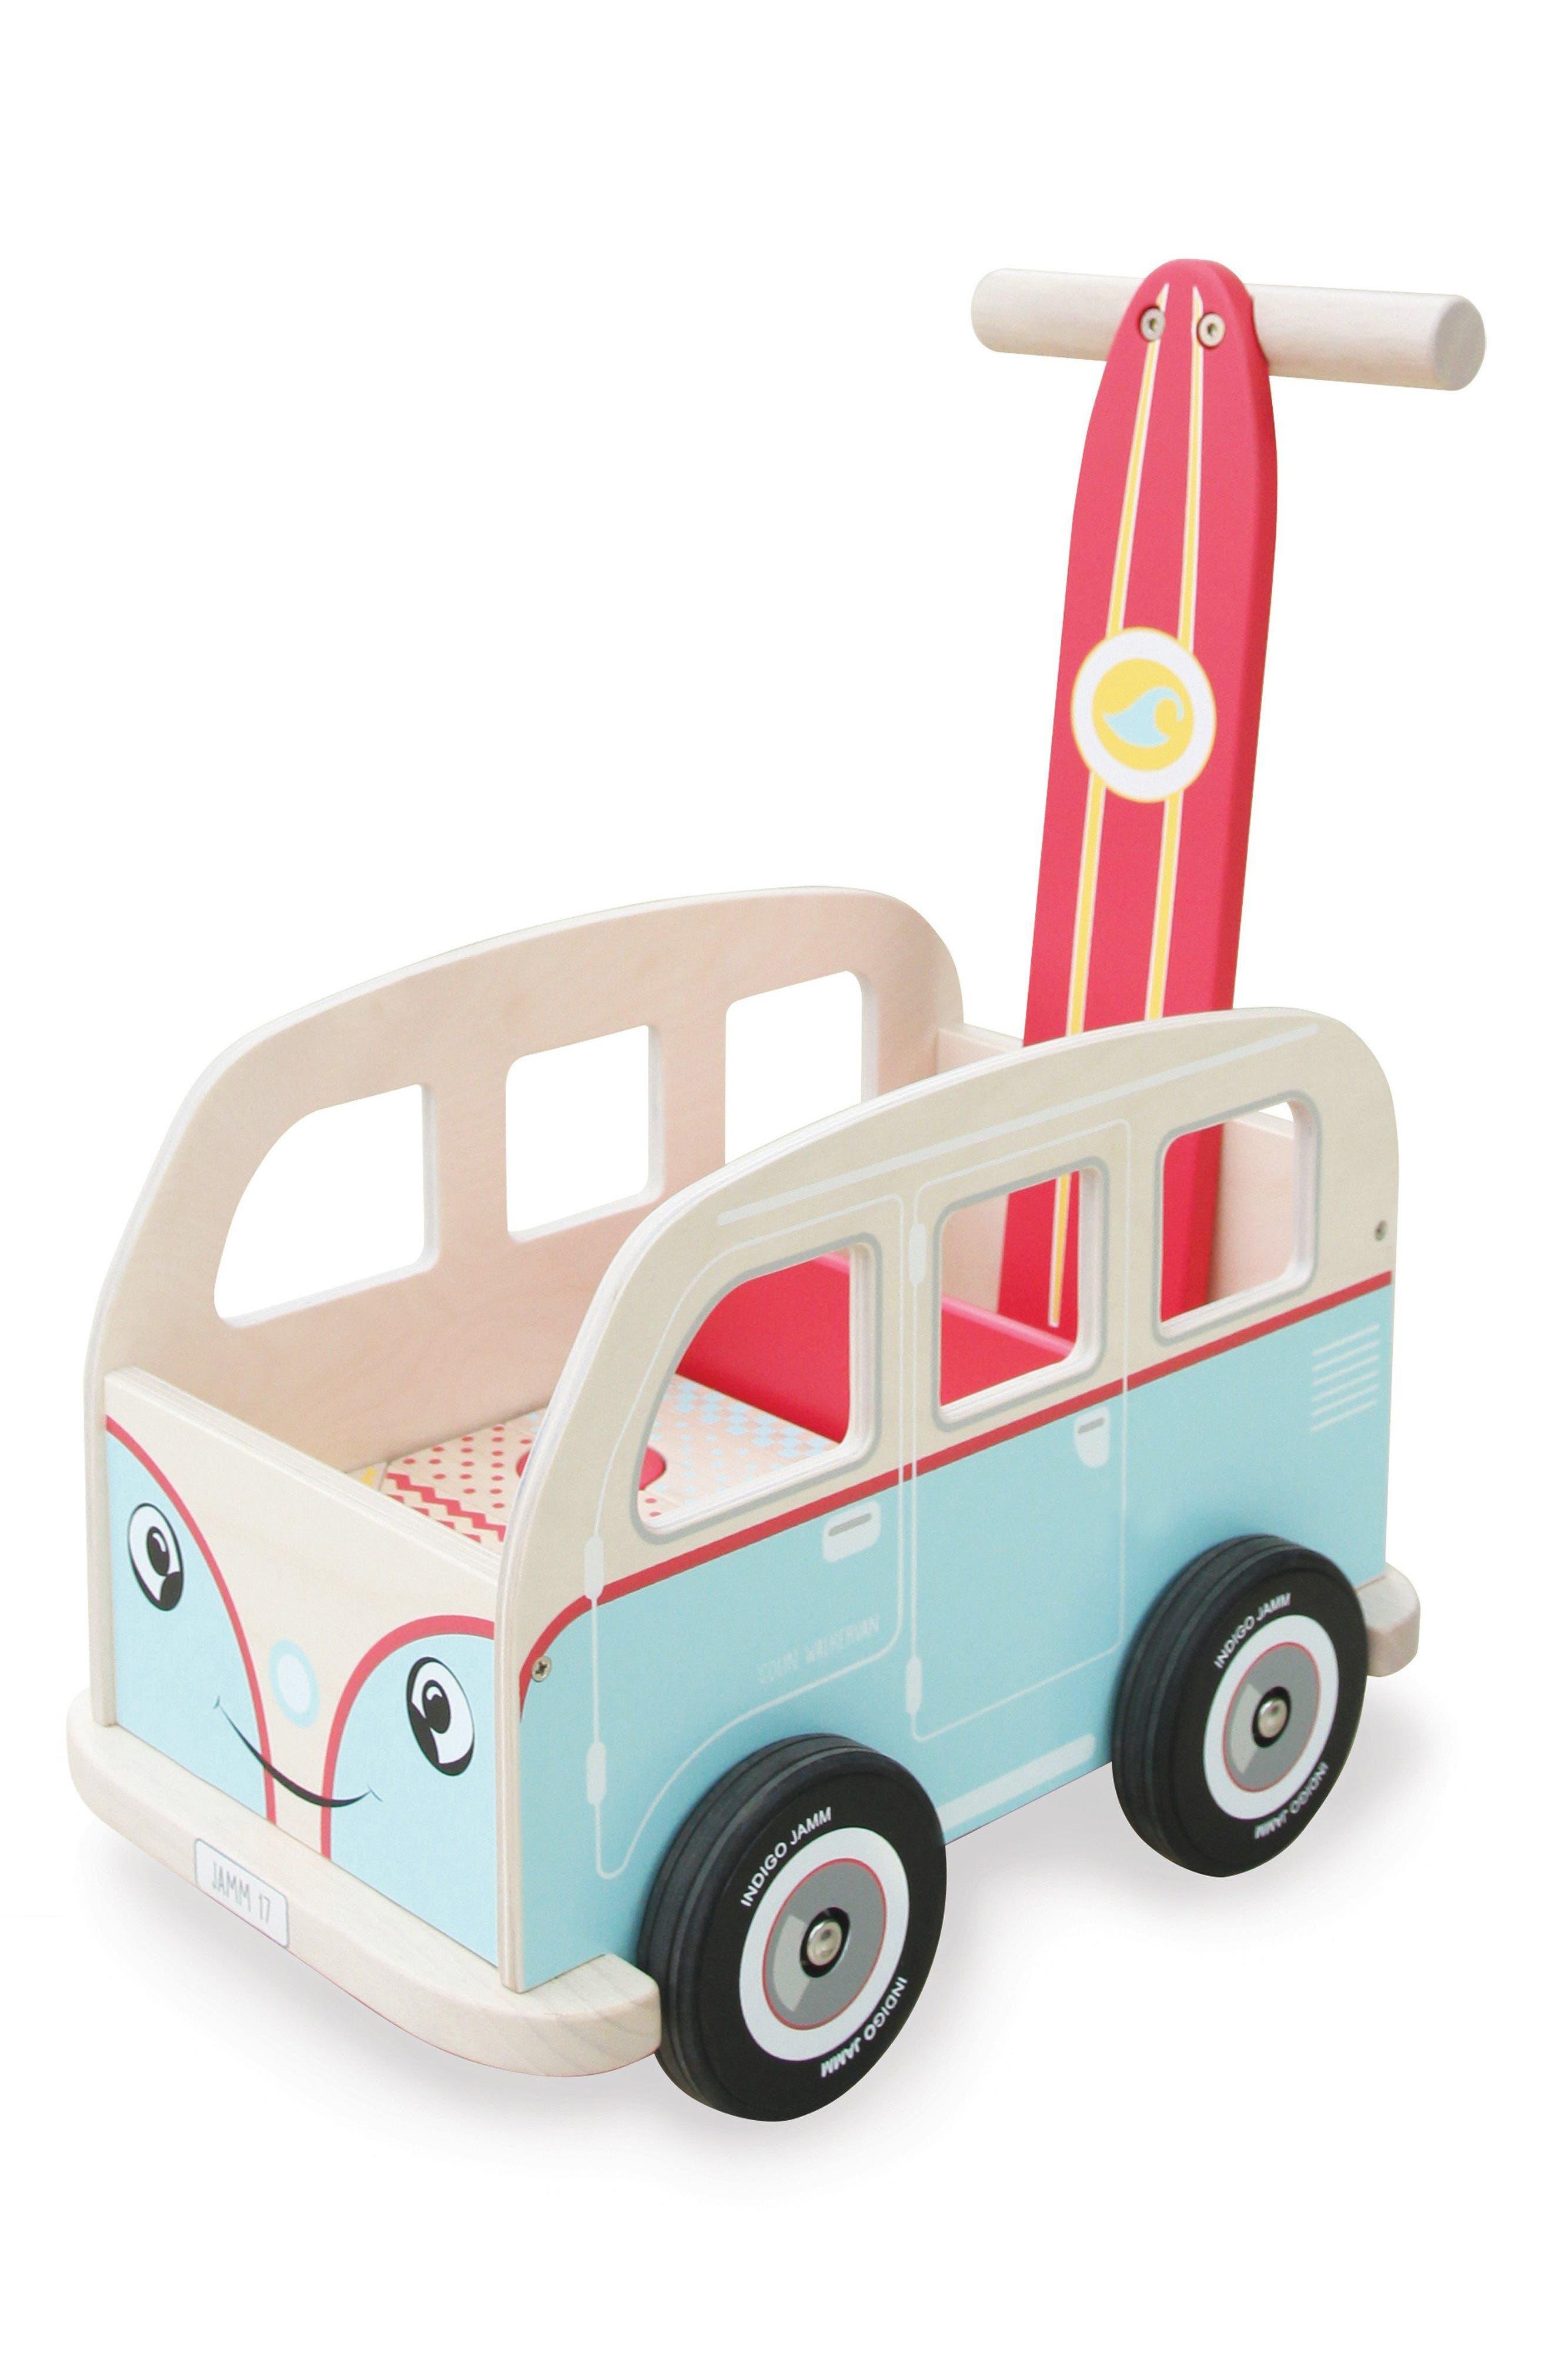 Main Image - Indigo Jamm Van Push Toy